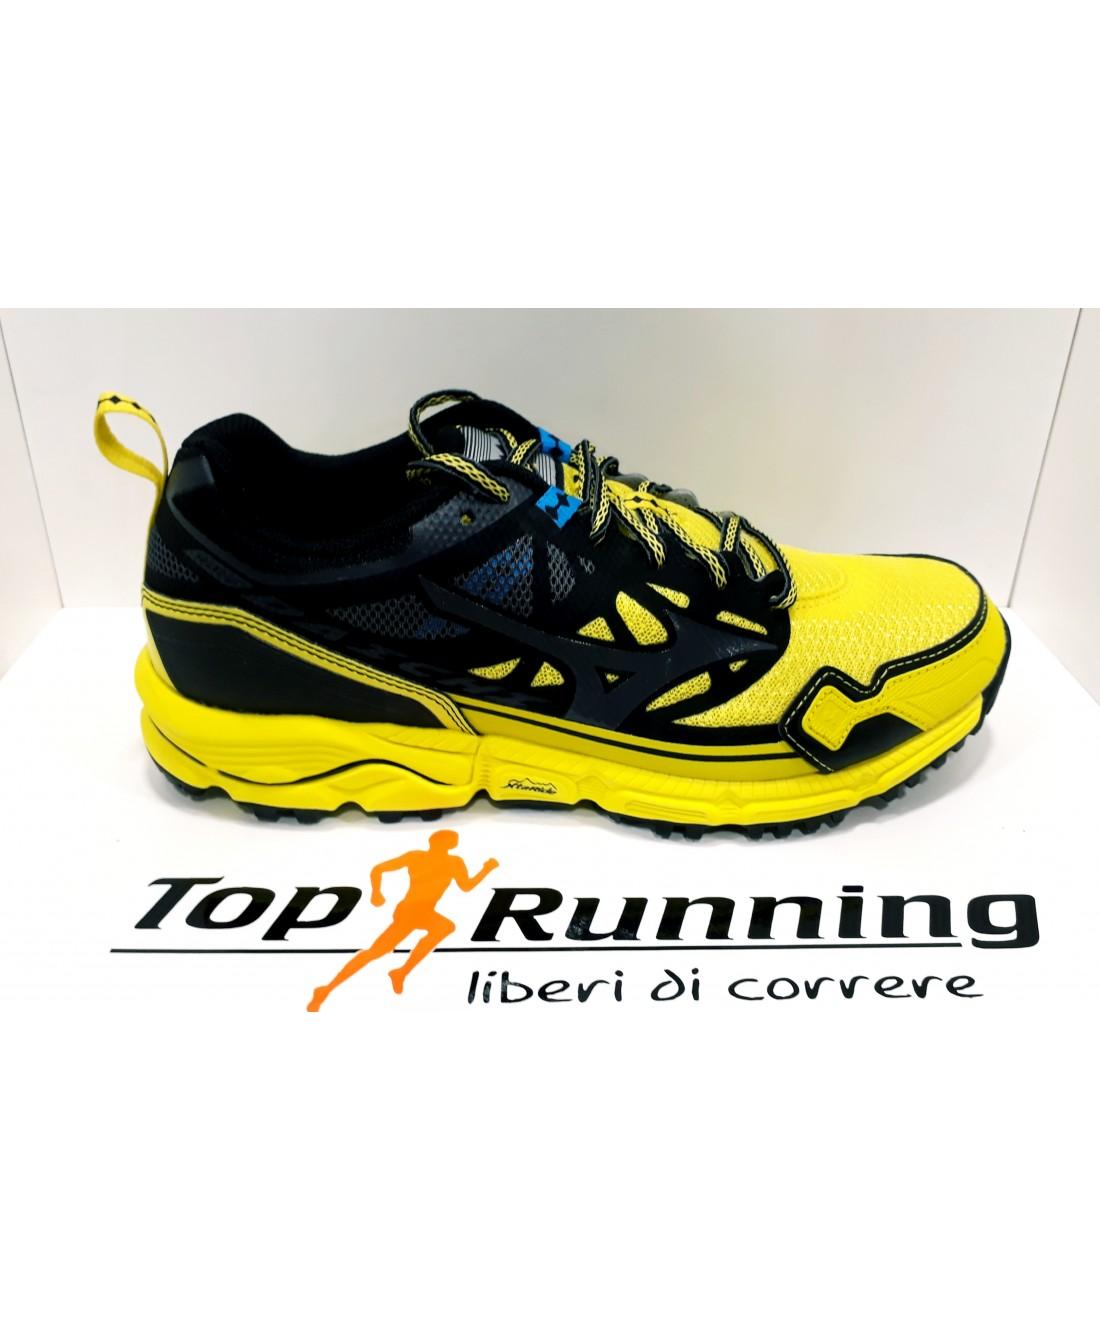 size 40 4d24b 93ec8 Scarpe da running - MIZUNO WAVE DAICHI 4 UOMO - Top Running ...